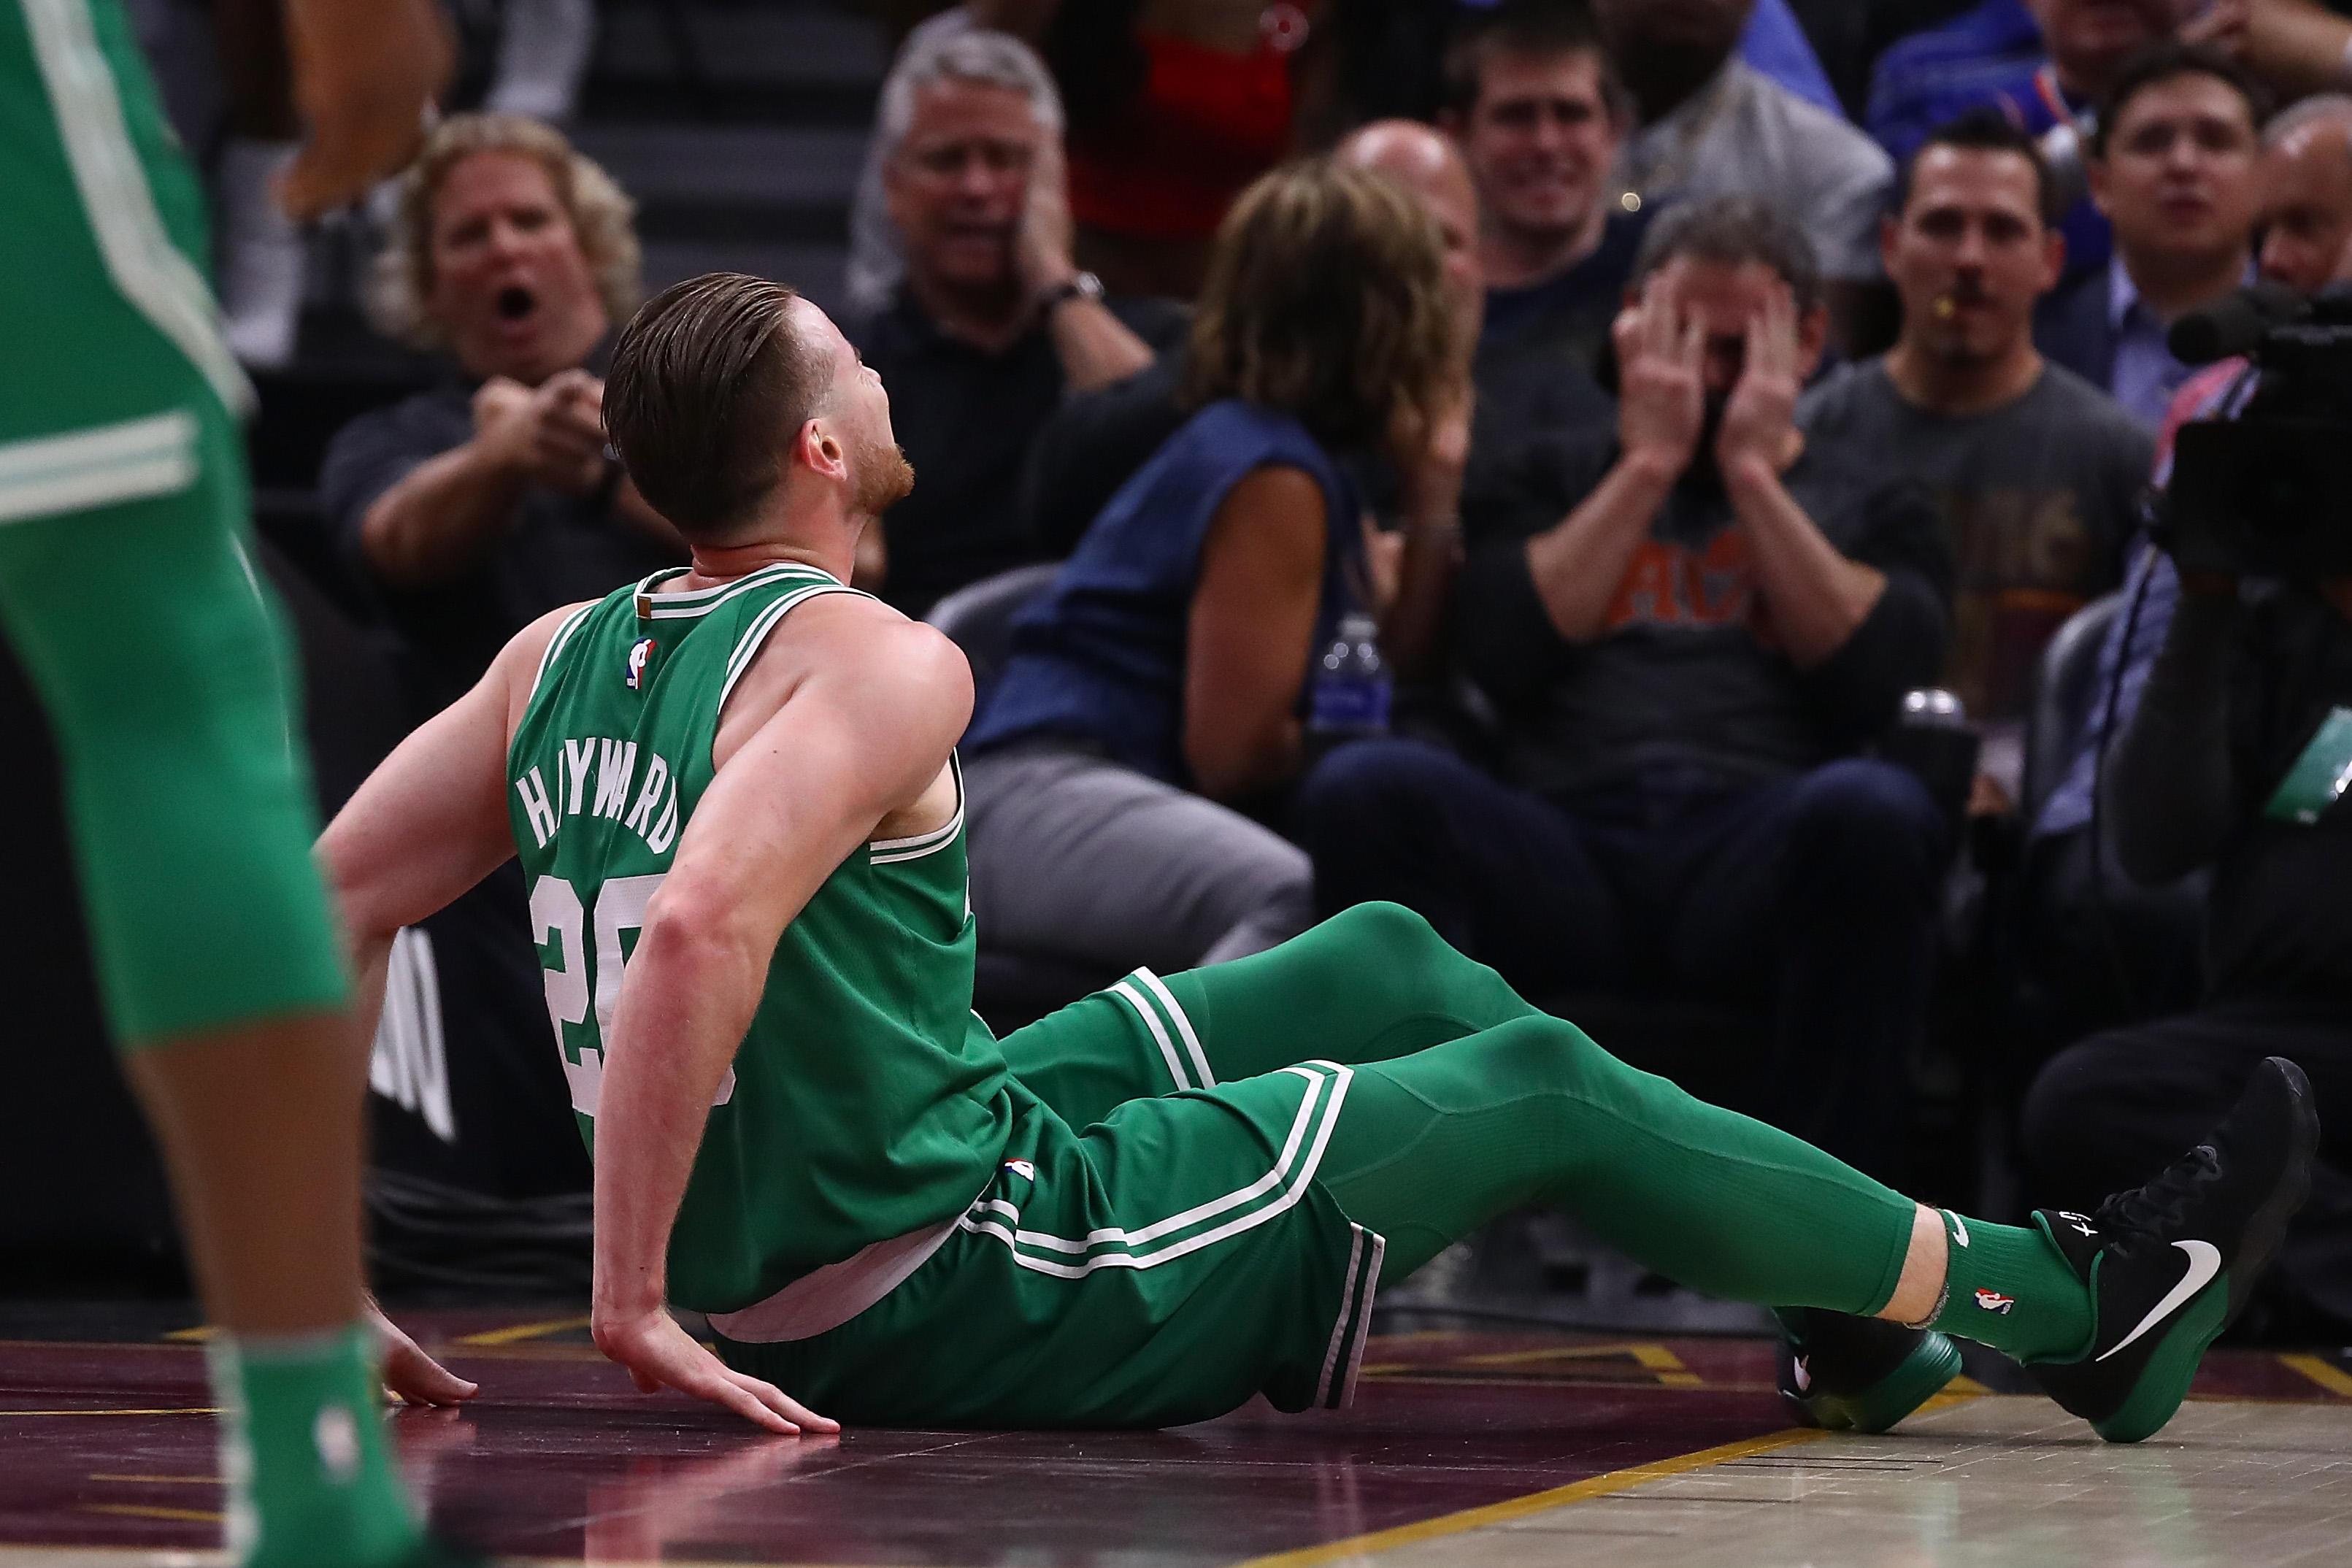 69a802e28e6 Celtics star Gordon Hayward suffers gruesome injury in opener - CBS News